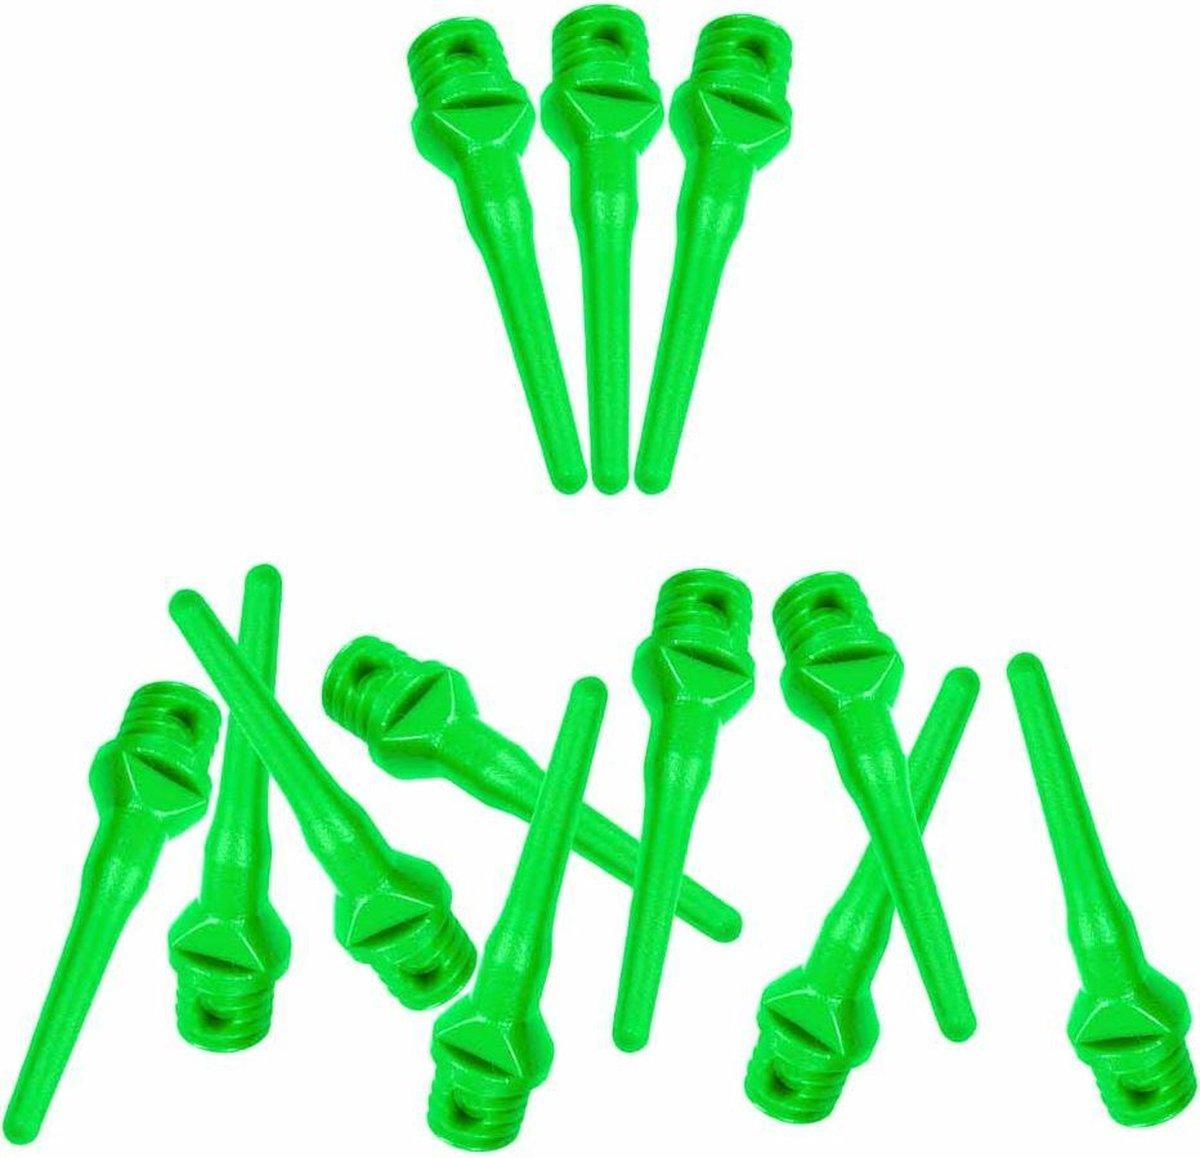 ABC Darts - Softtip Dartpunten 25 mm - Neon Groen - ca 1000 stuks